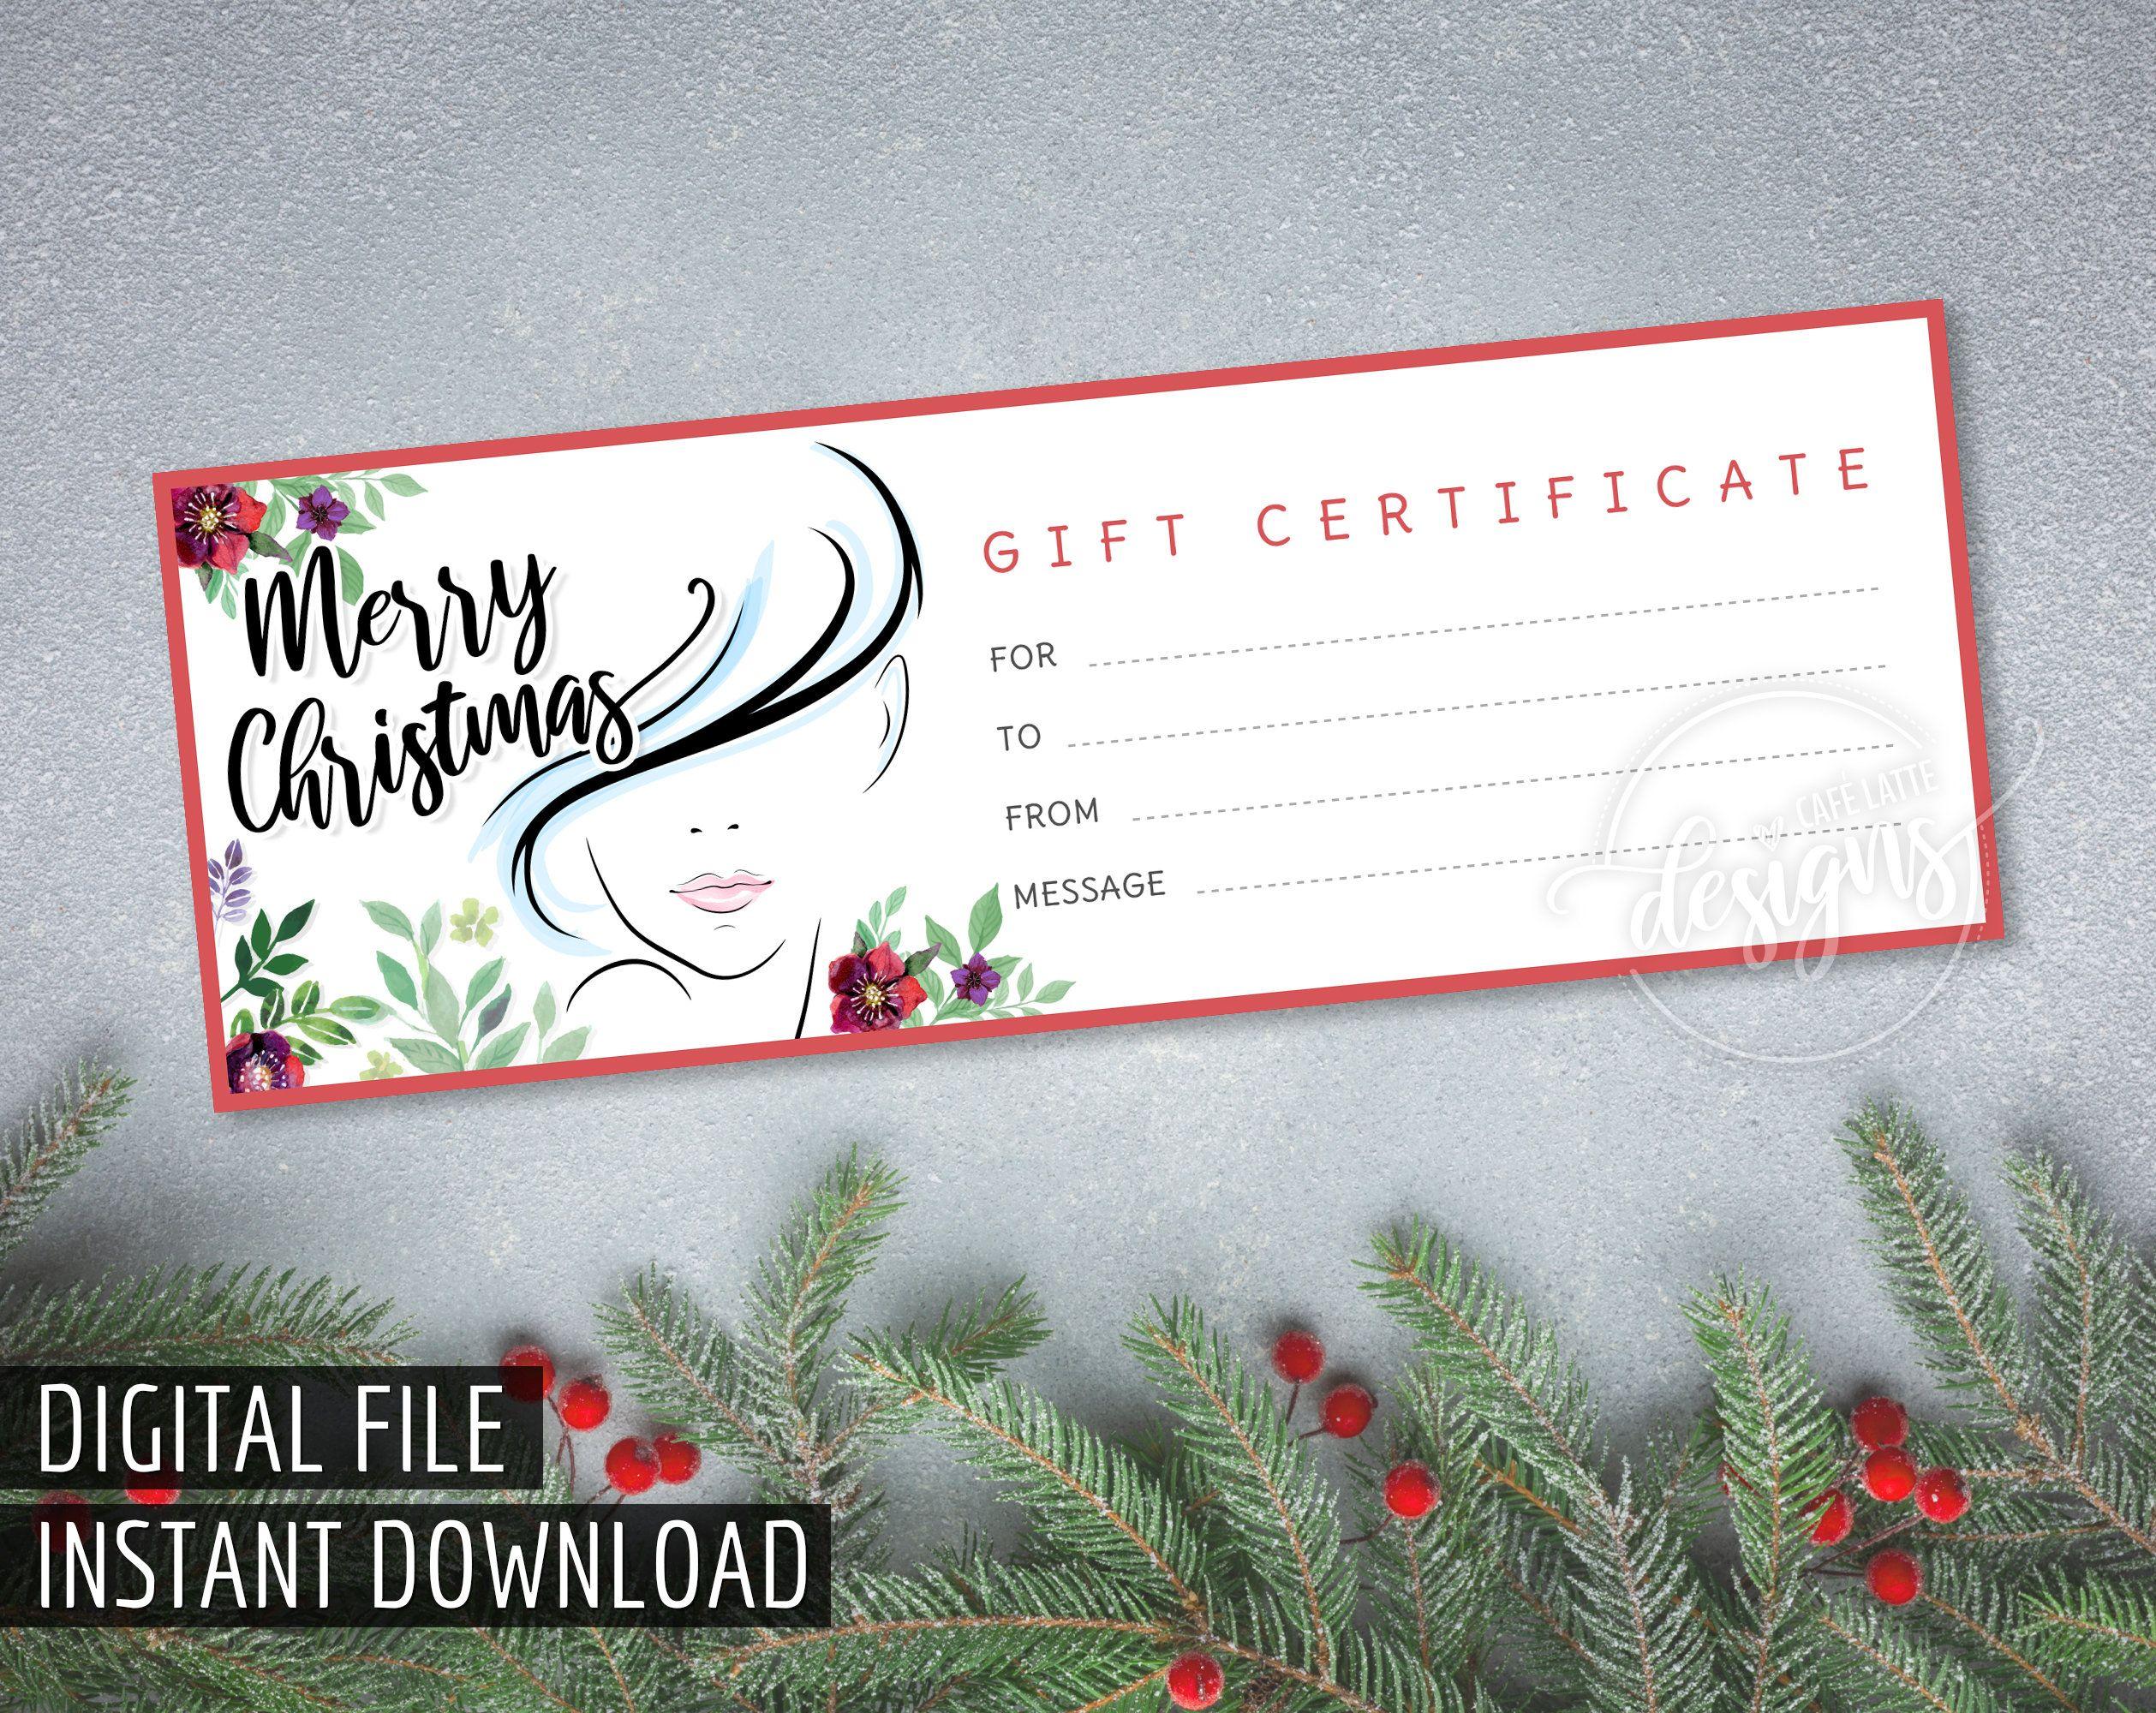 Christmas Gift Certificate Hair Salon Spa Printable Gift Etsy Holiday Gift Card Printable Gift Certificate Christmas Gift Certificate